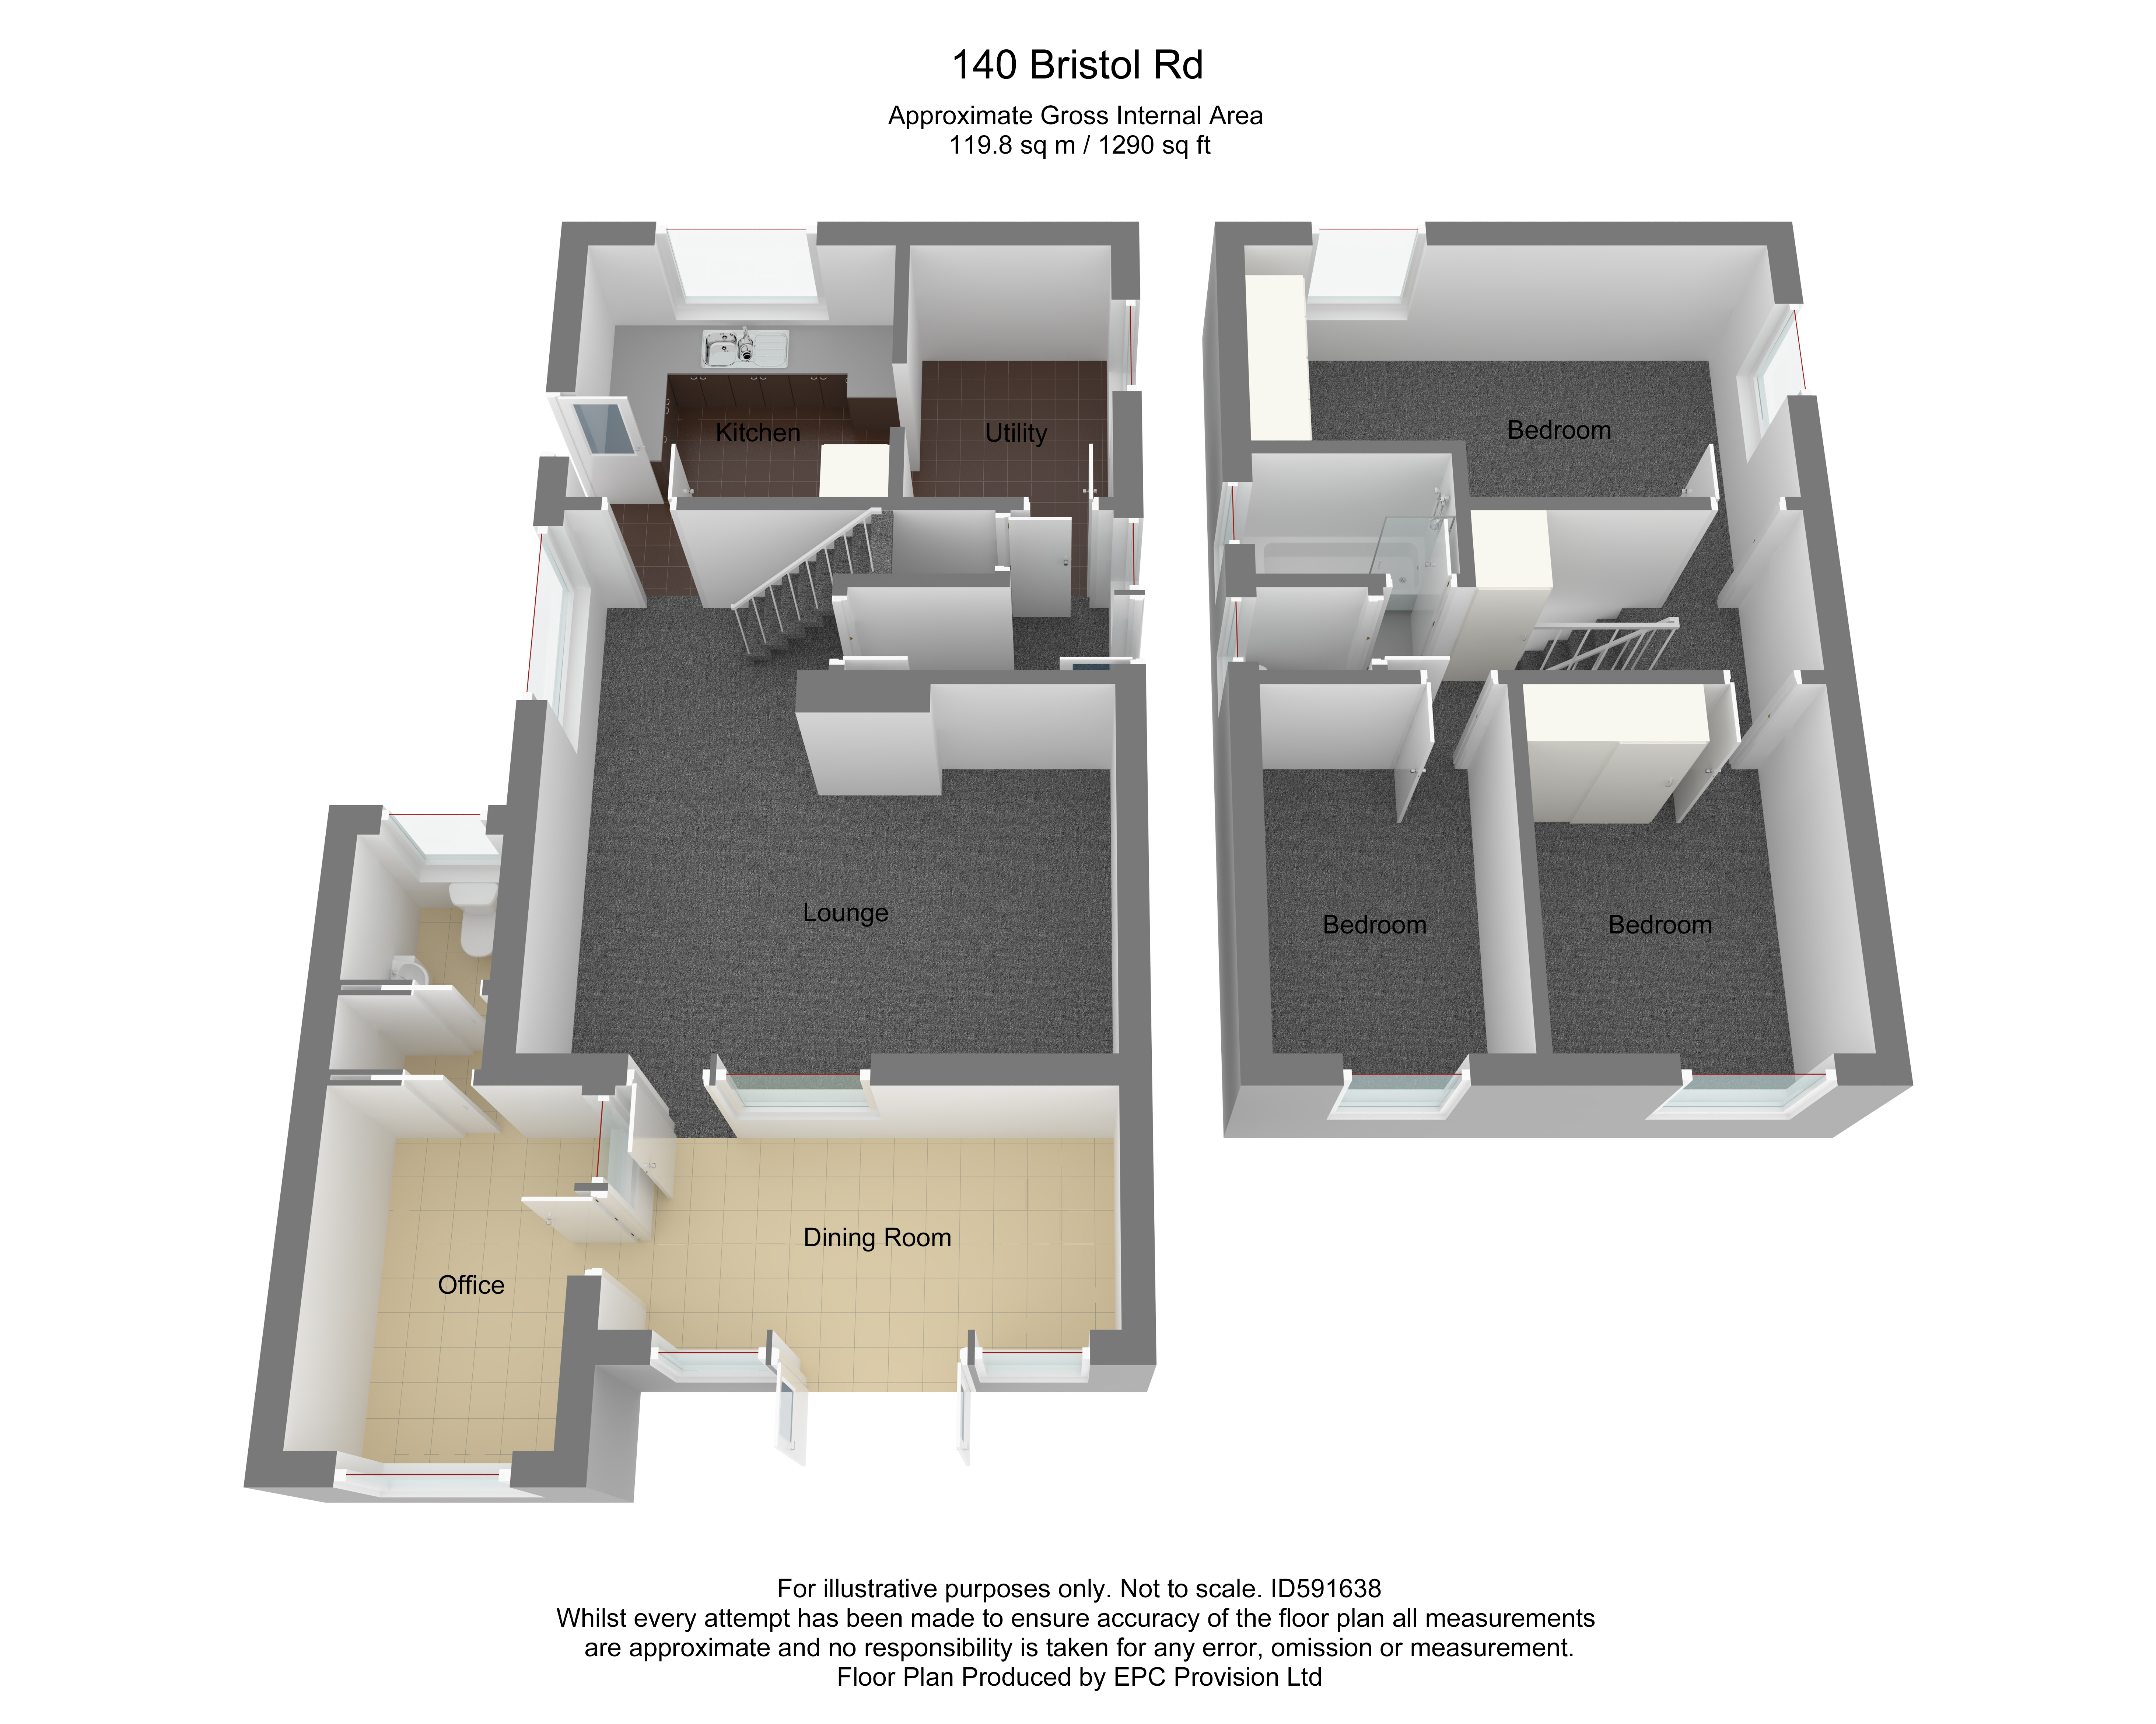 Floorplan for Bristol Road, Frampton Cotterell.